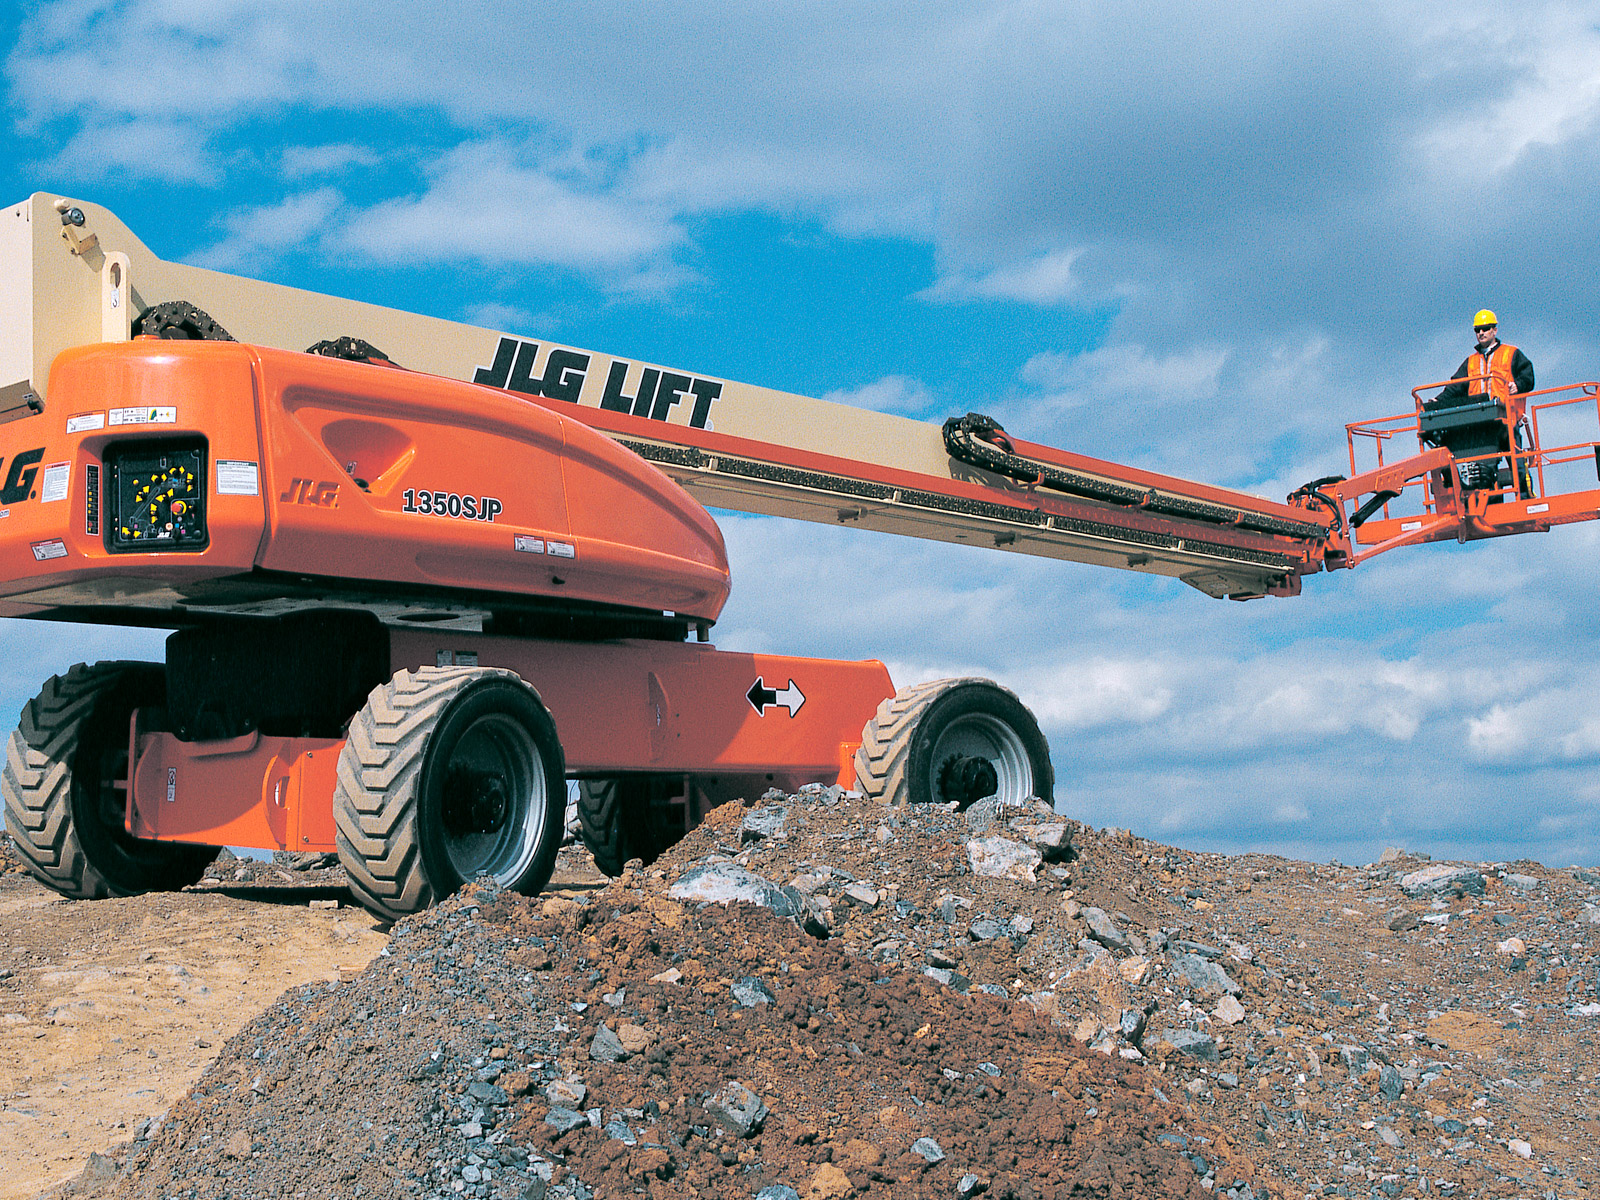 1350sjp driving?w=100 1350sjp telescopic boom lift jlg  at crackthecode.co